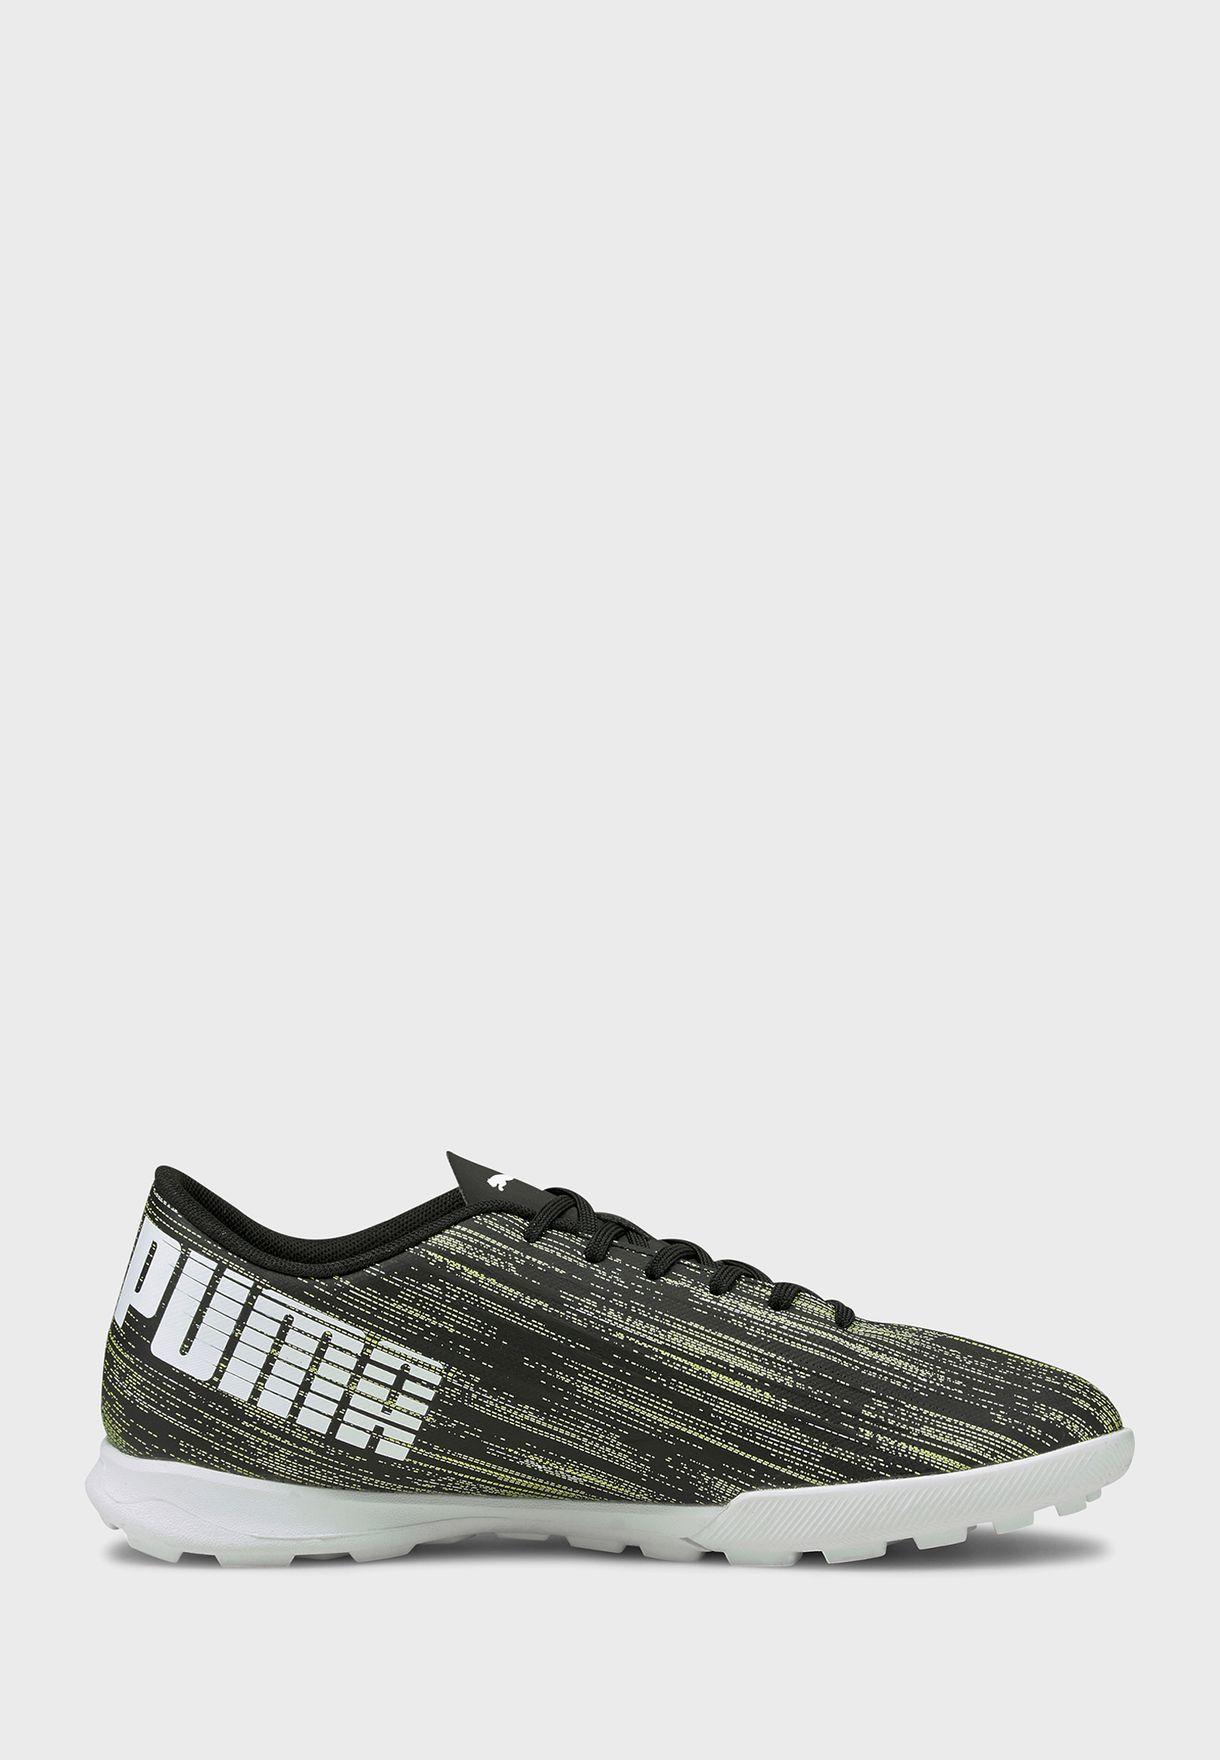 حذاء الترا 4.2 تي تي